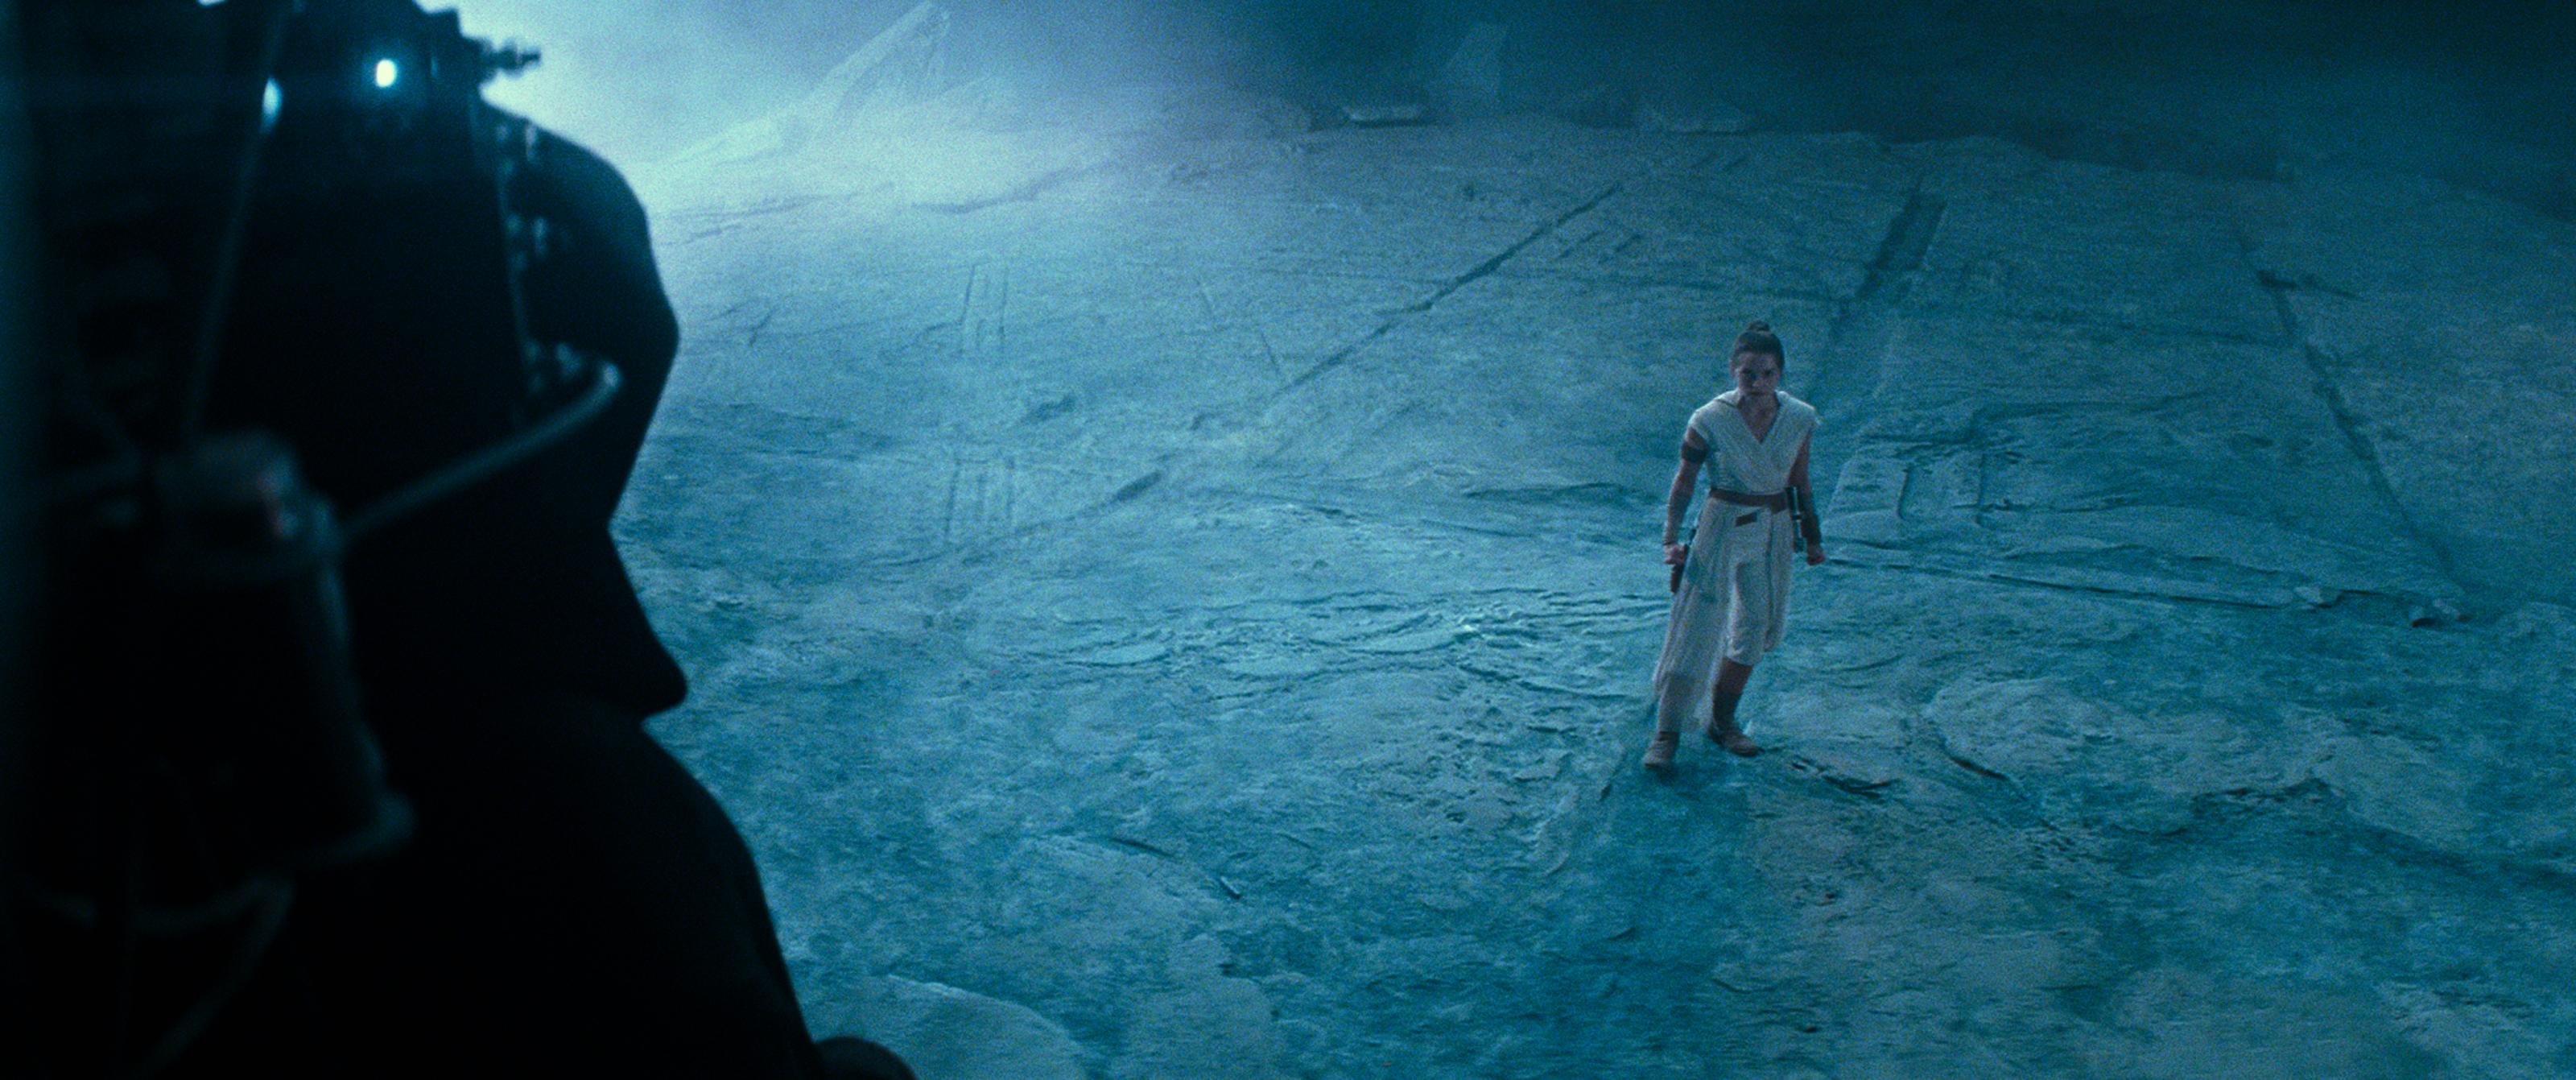 The Rise Of Skywalker Battle Of Exegol Is A Star Wars Saga Highlight